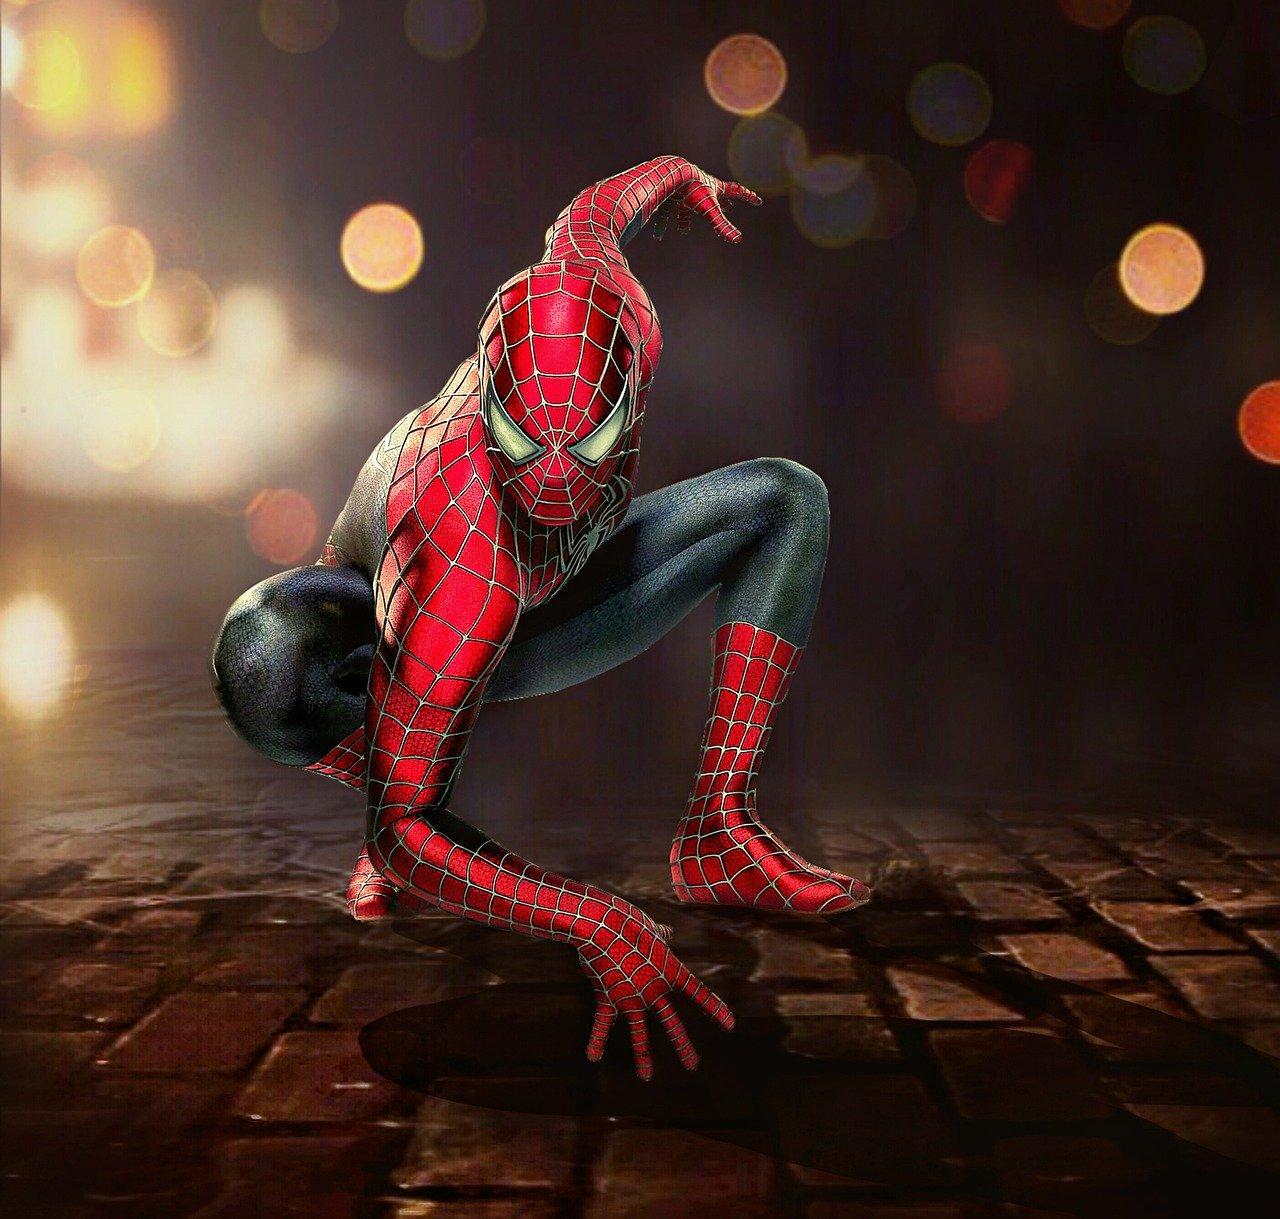 Spiderman contra Scorsese